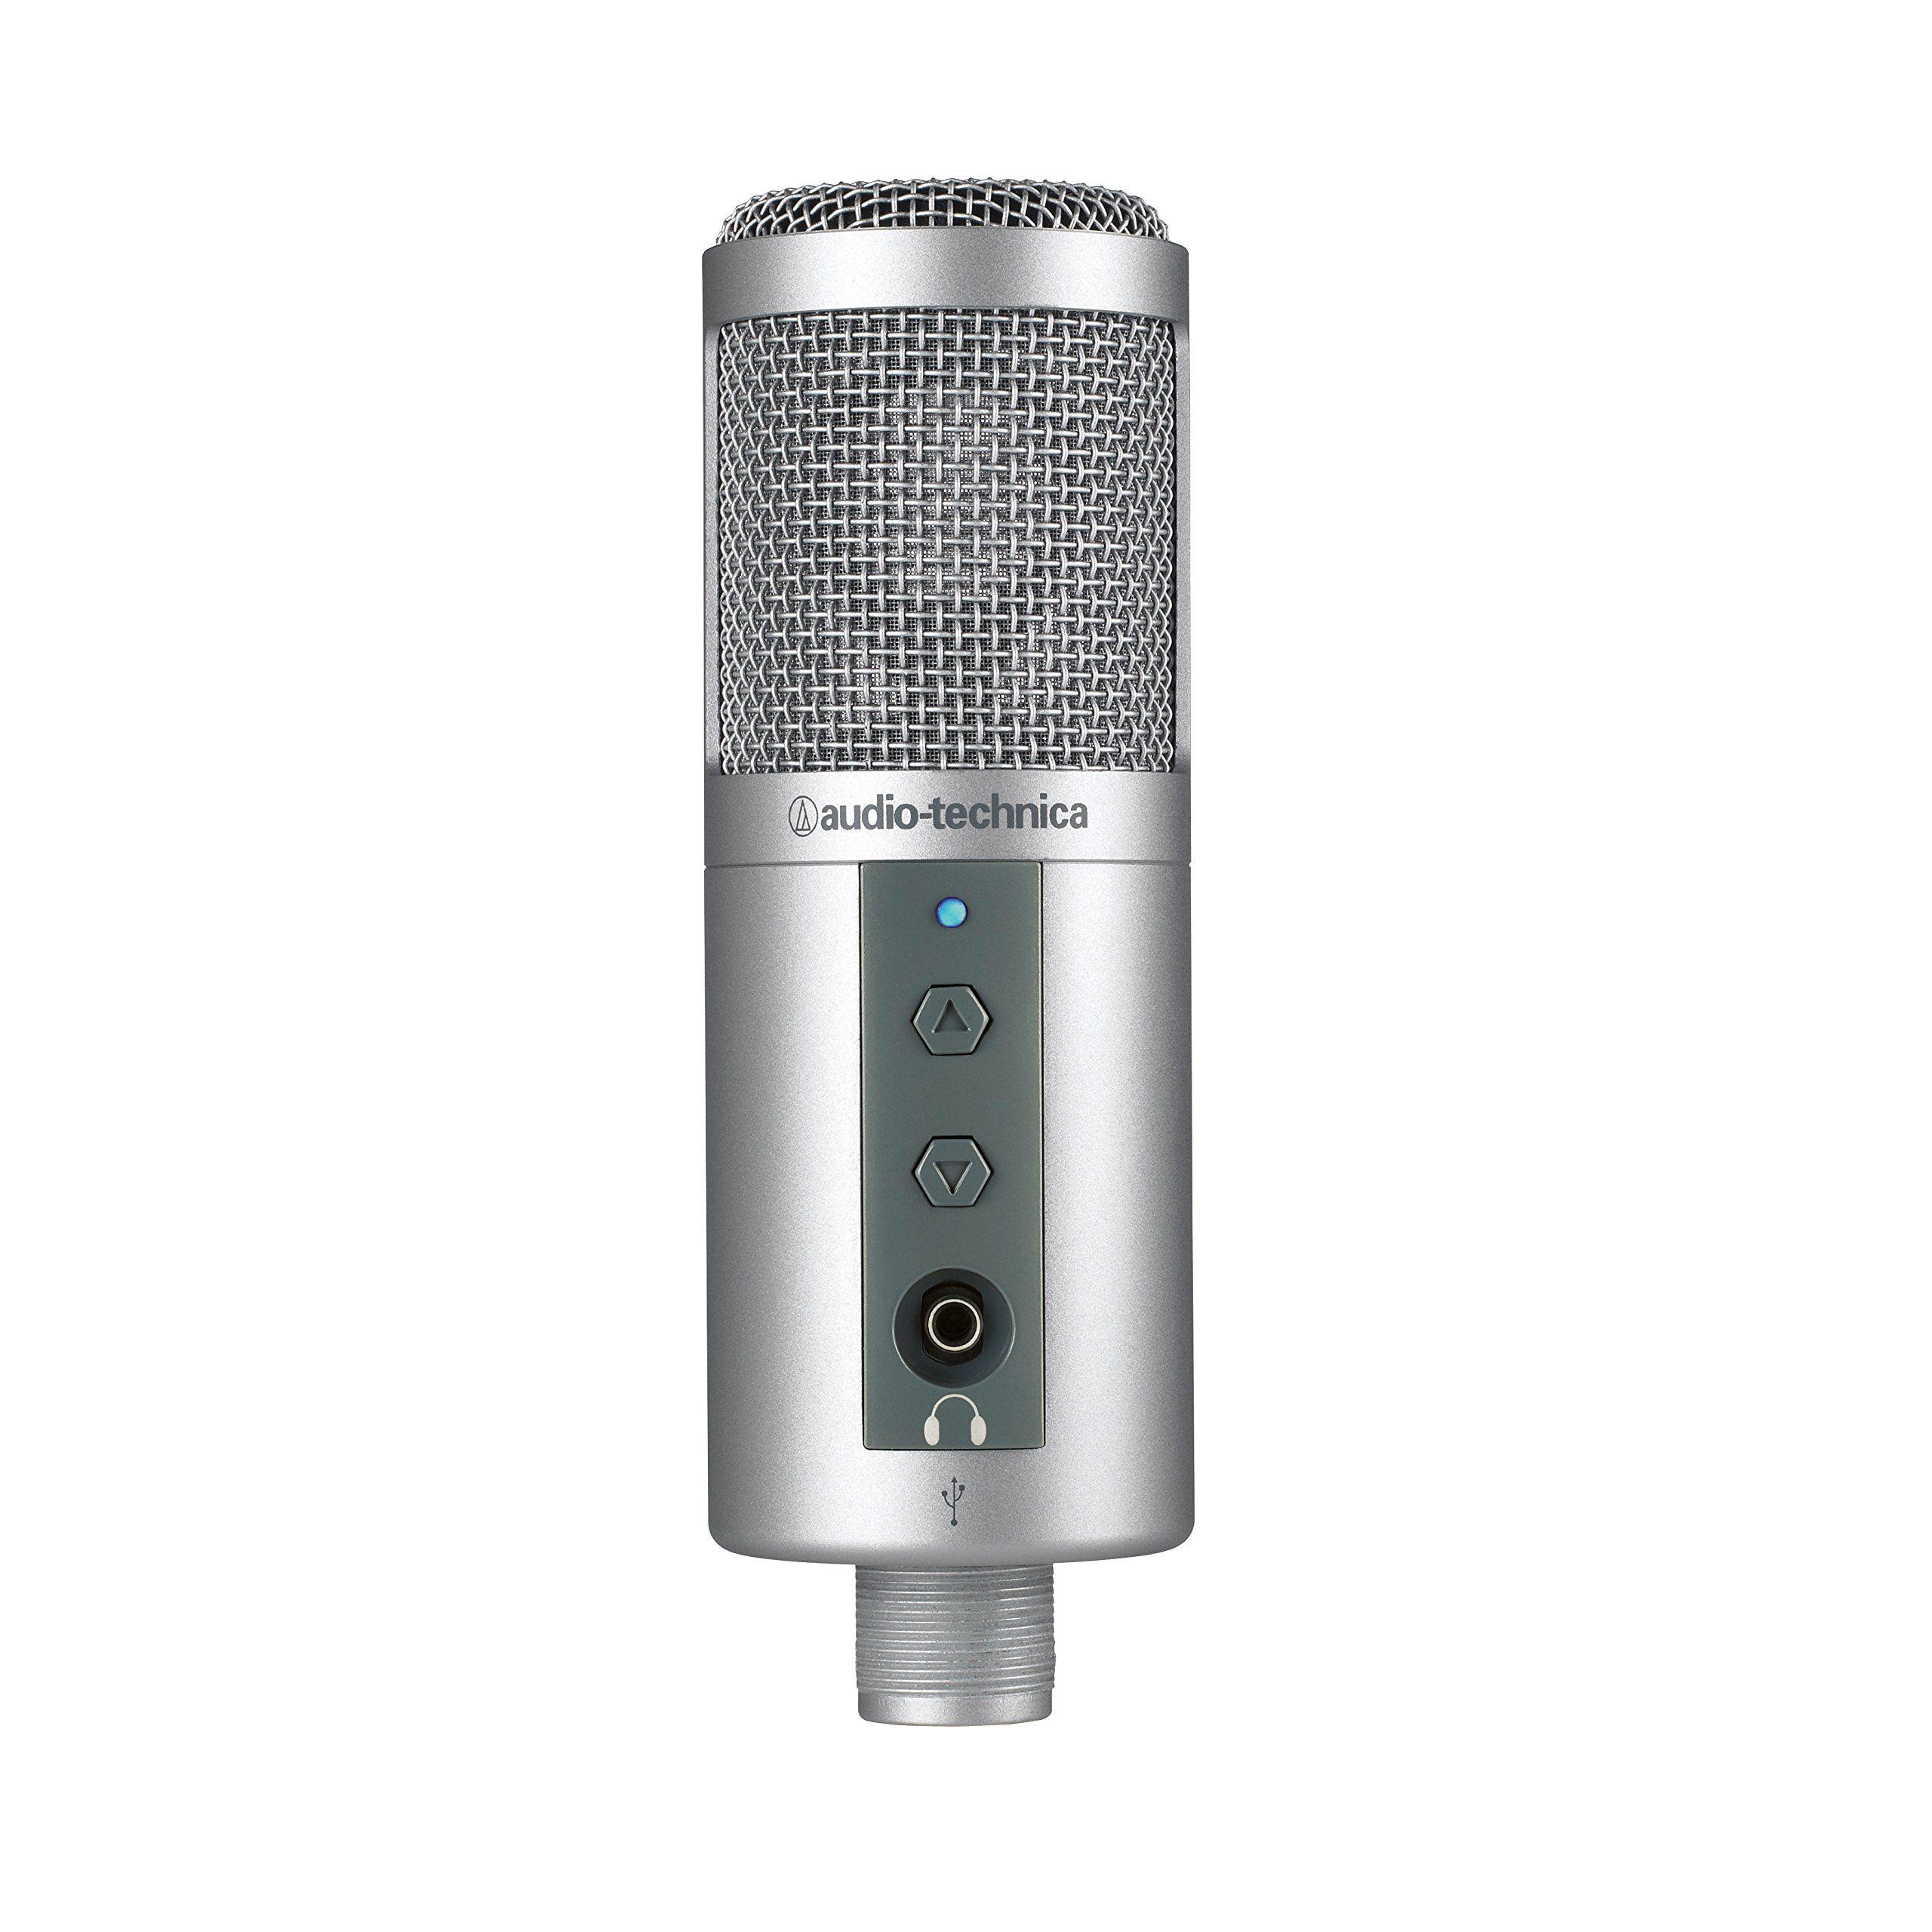 Audio Technica Atr2500 Usb Cardioid Condenser Usb Microphone Usb Microphone Best Usb Microphone Audio Technica